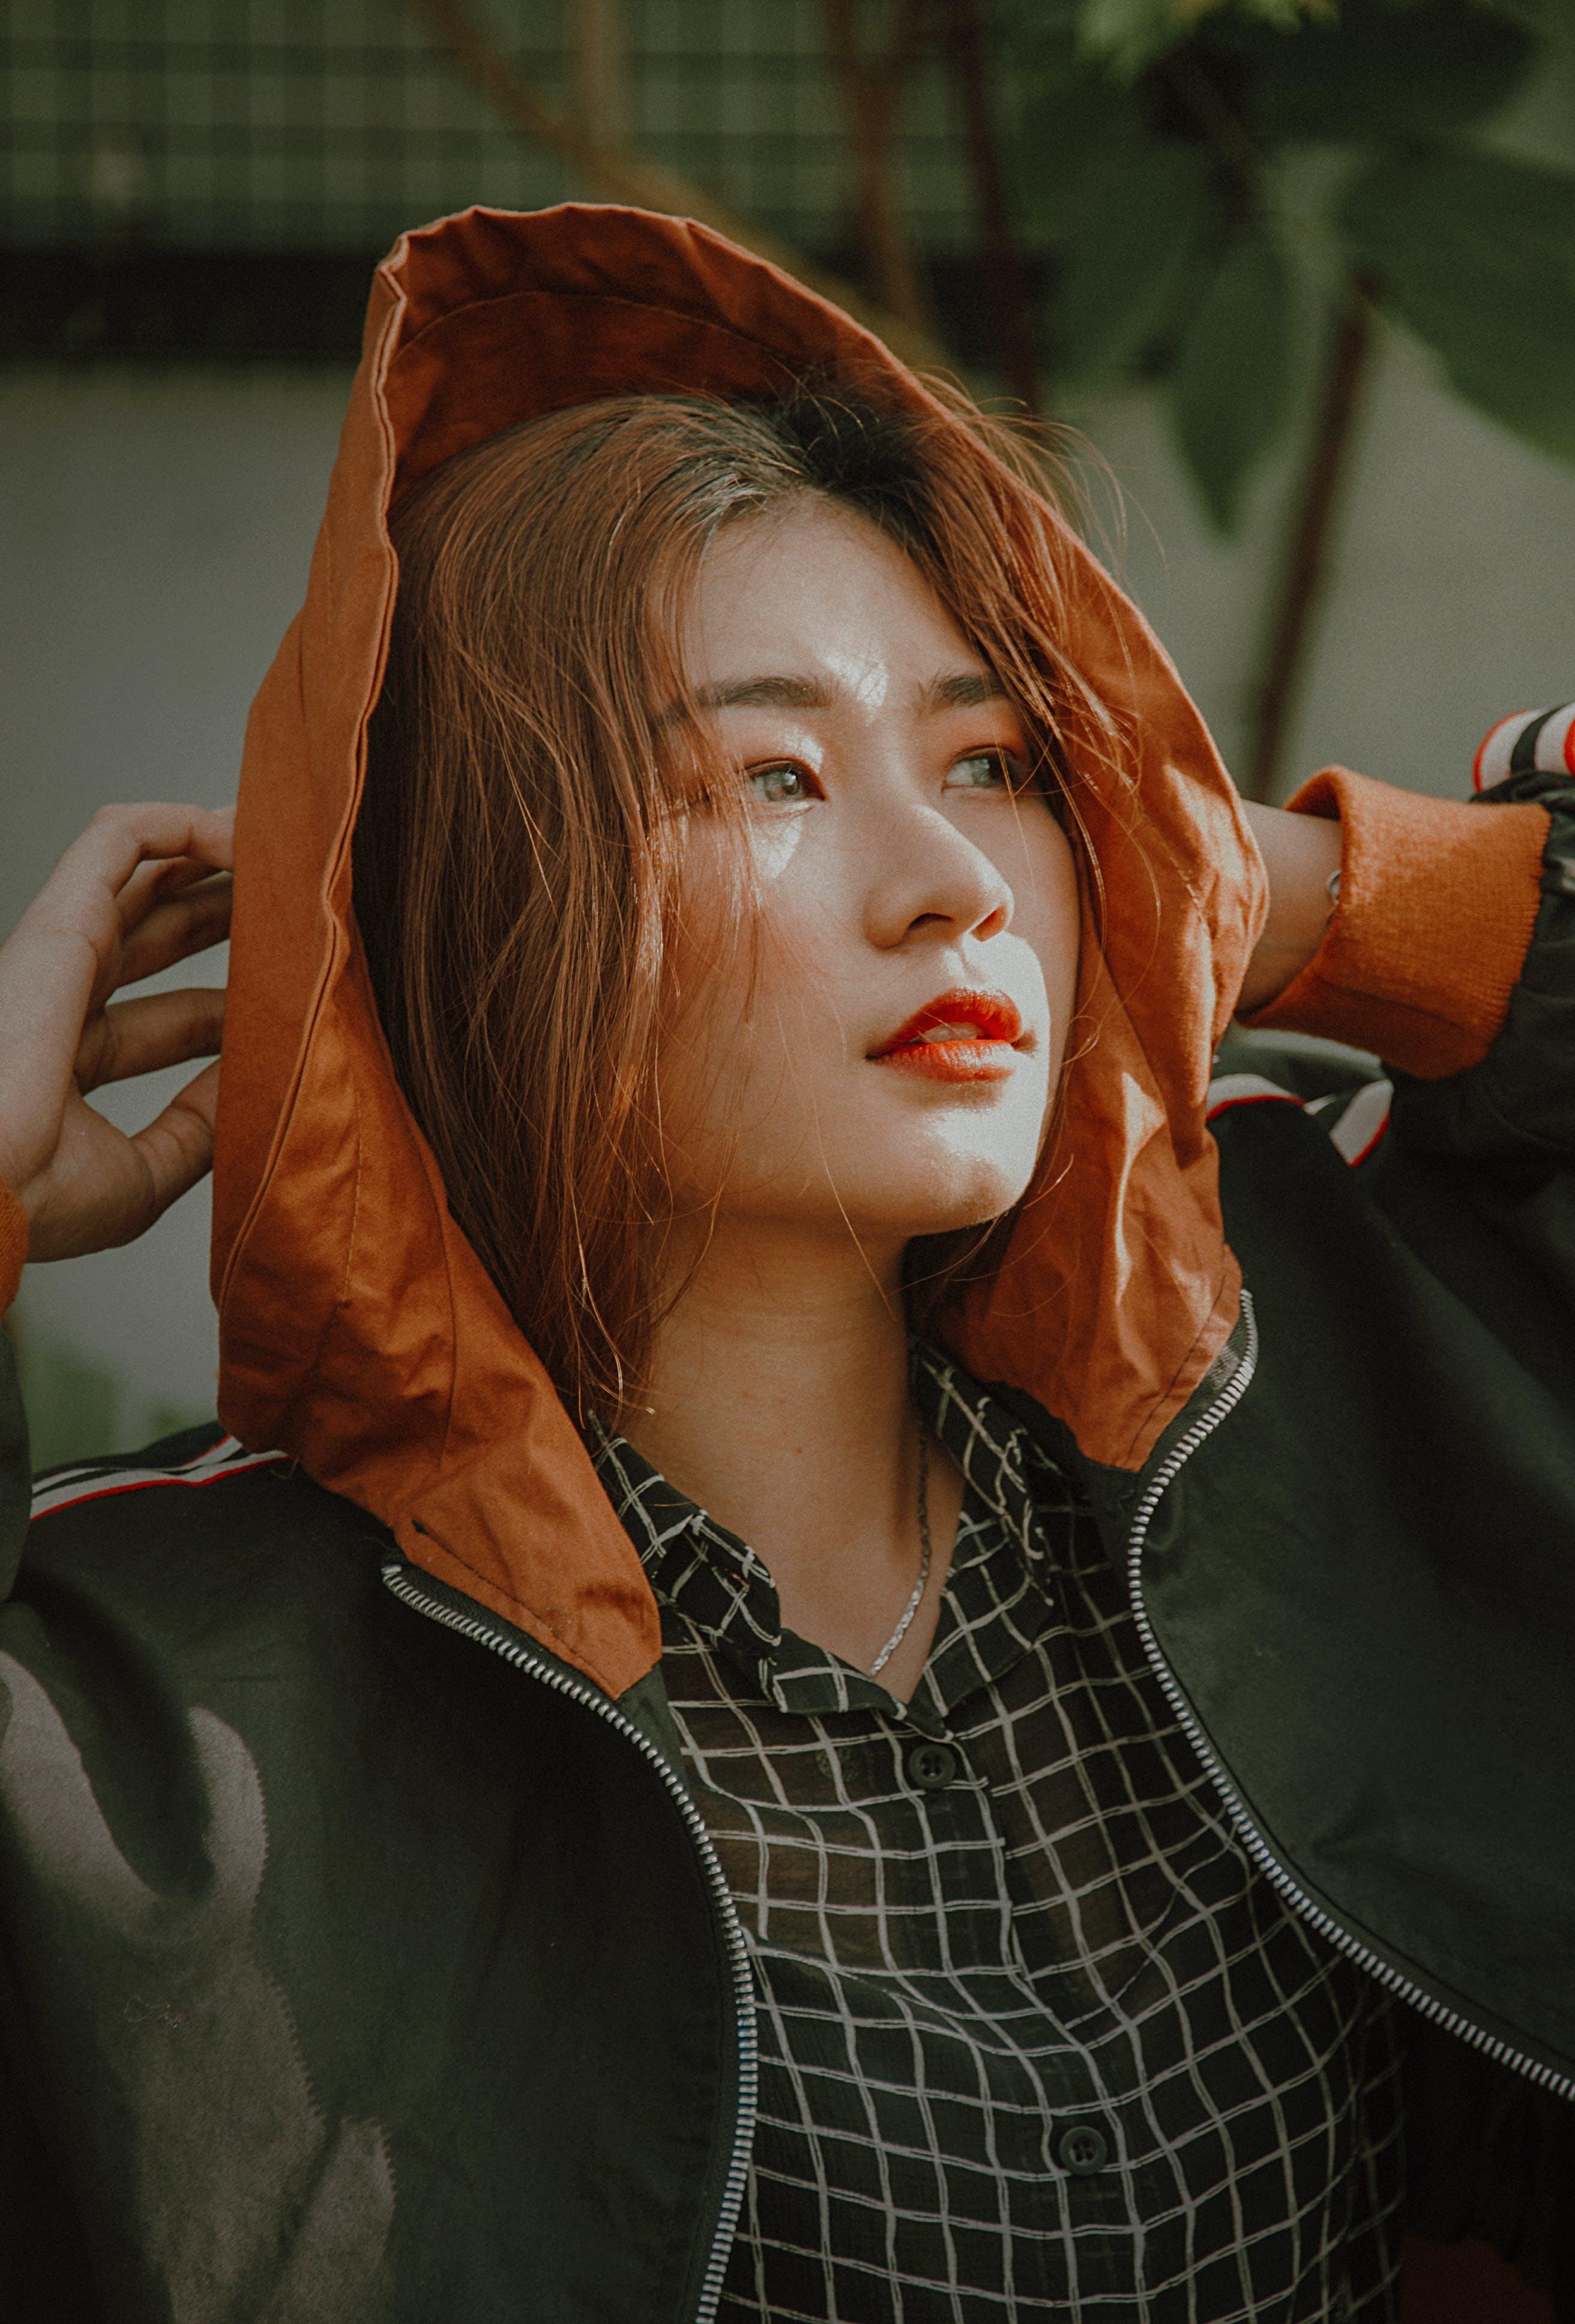 Woman Wearing Orange and Black Zip-up Jacket